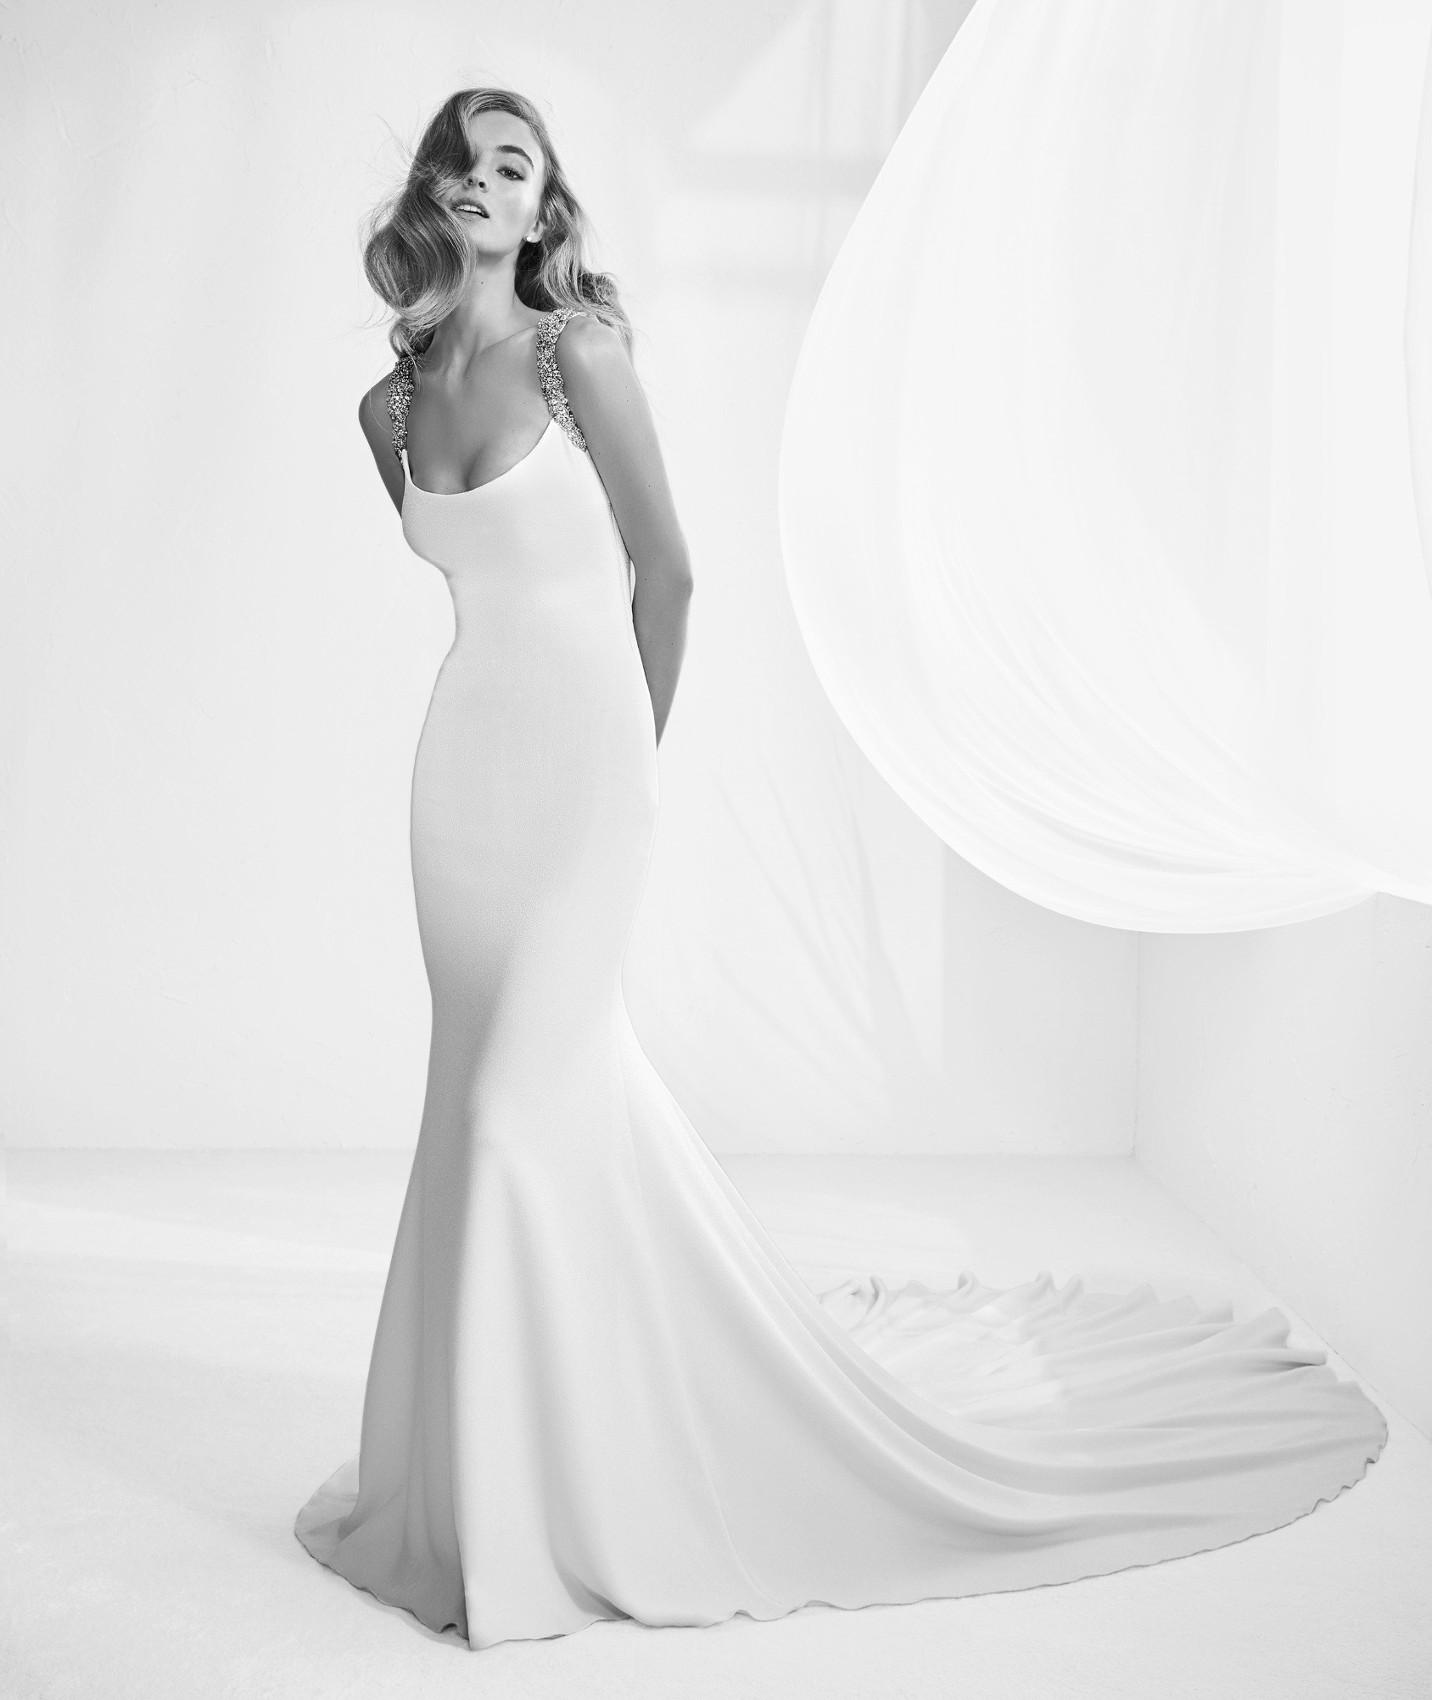 Rafia vestuvinė suknelė